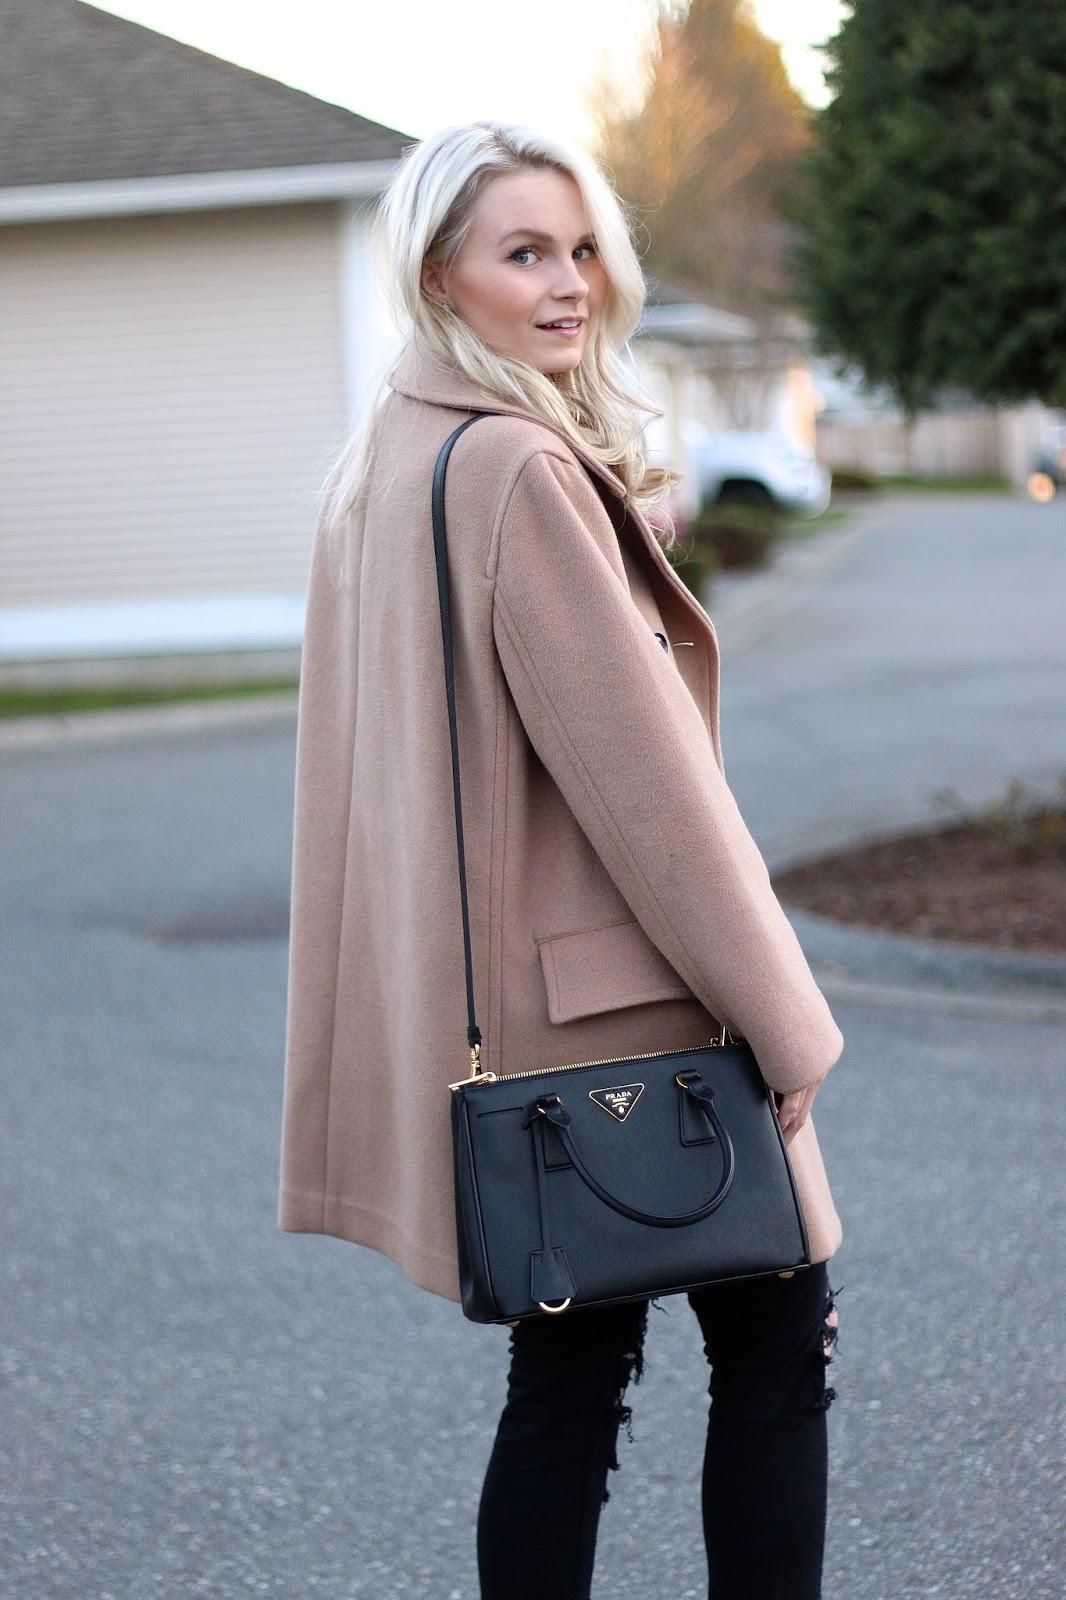 e0d5126d72f6 blonde blogger wearing fall style clothing and prada handbag ...